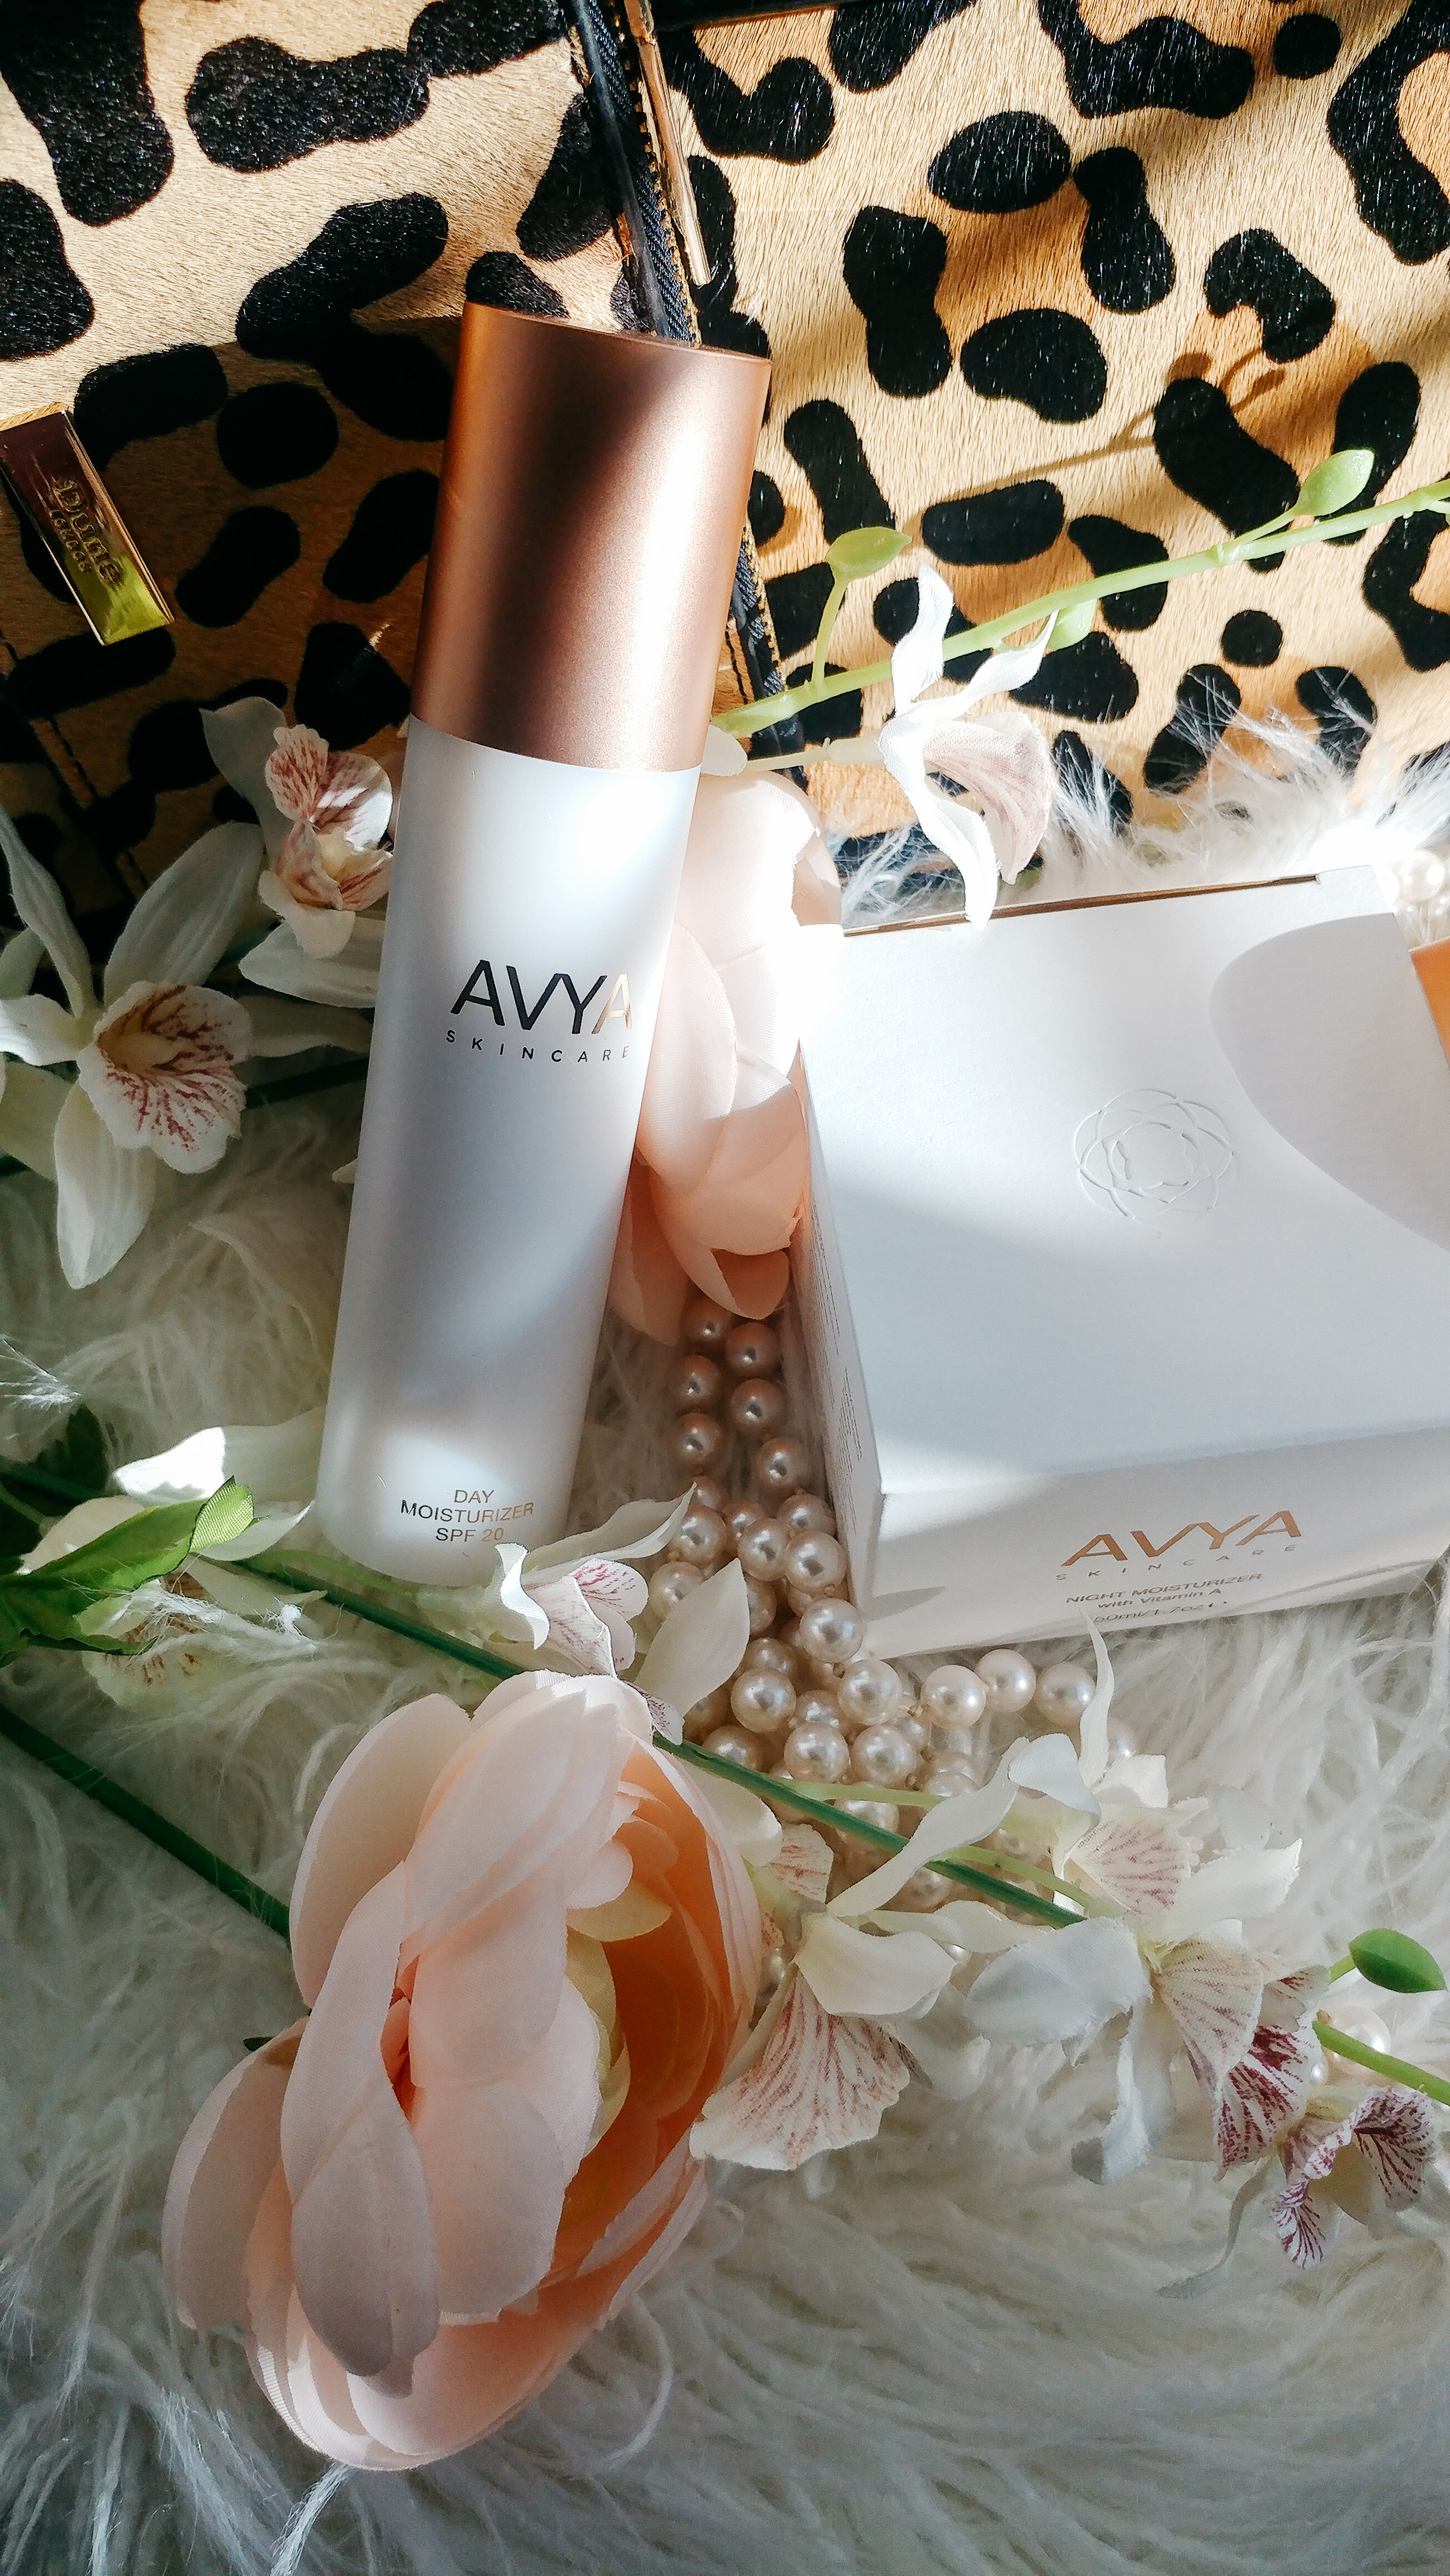 {Always Creating Blog // Avya x Always Creating Blog}